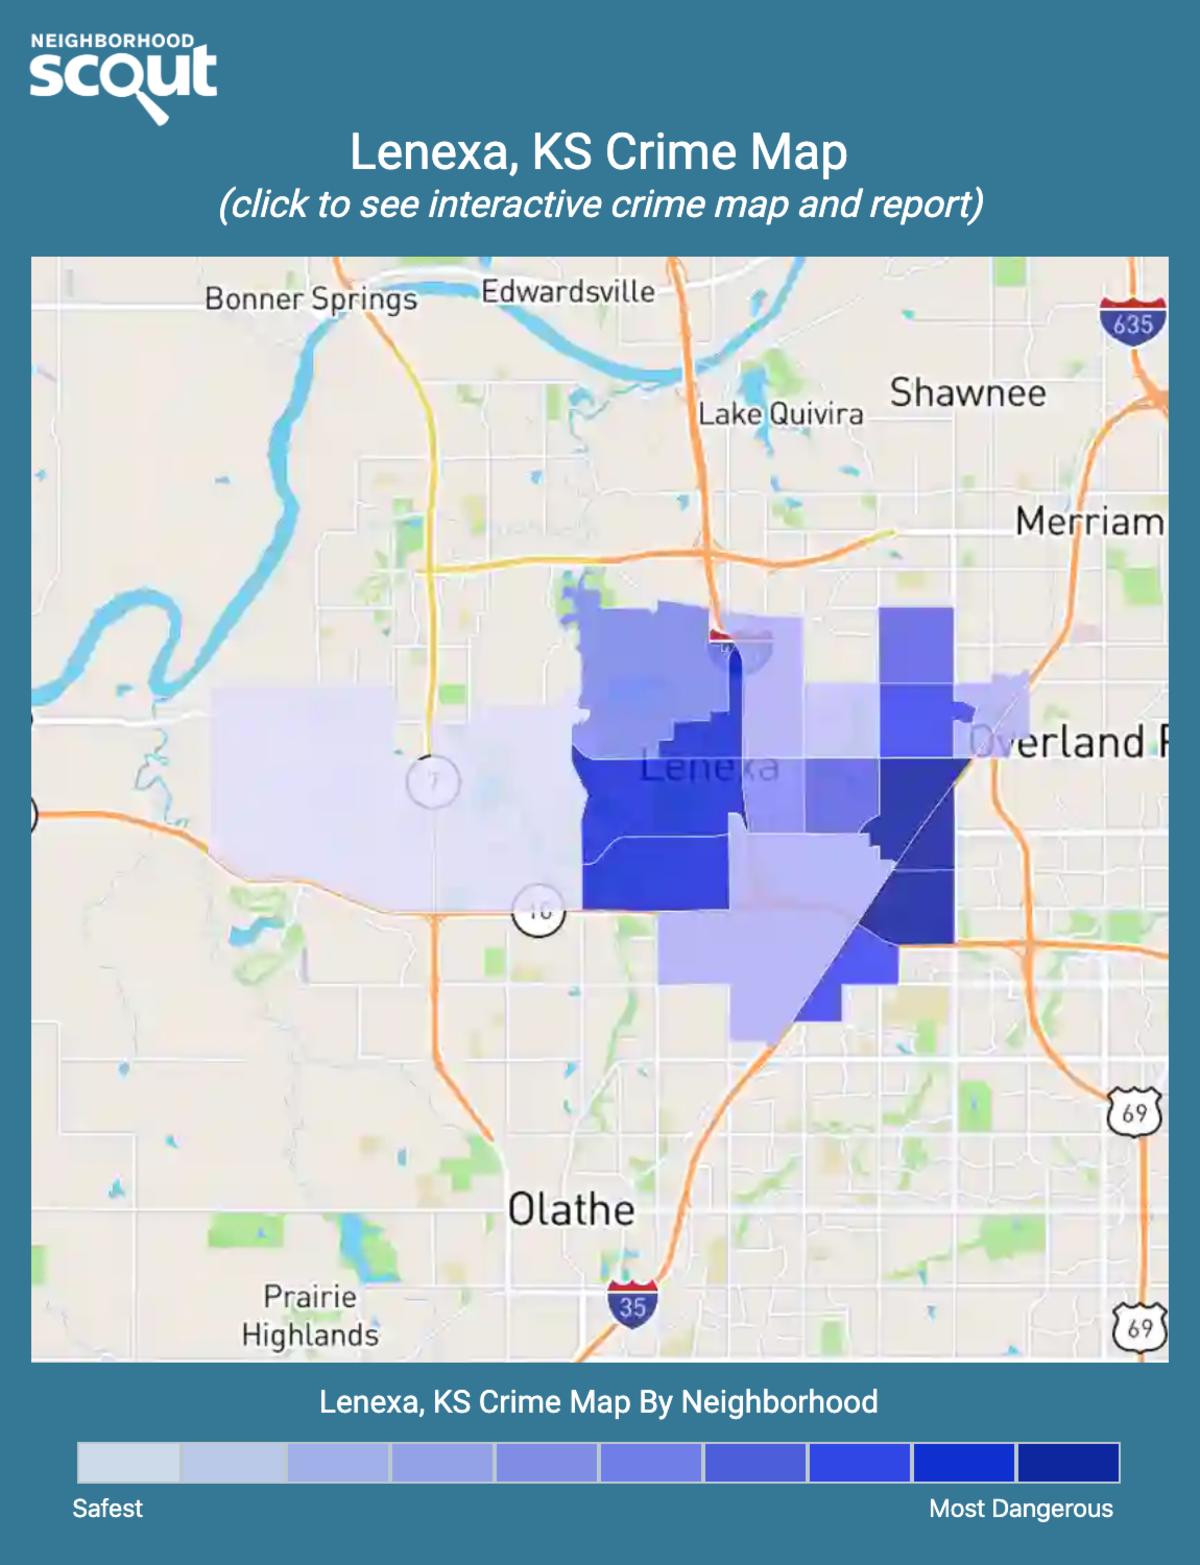 Lenexa, Kansas crime map